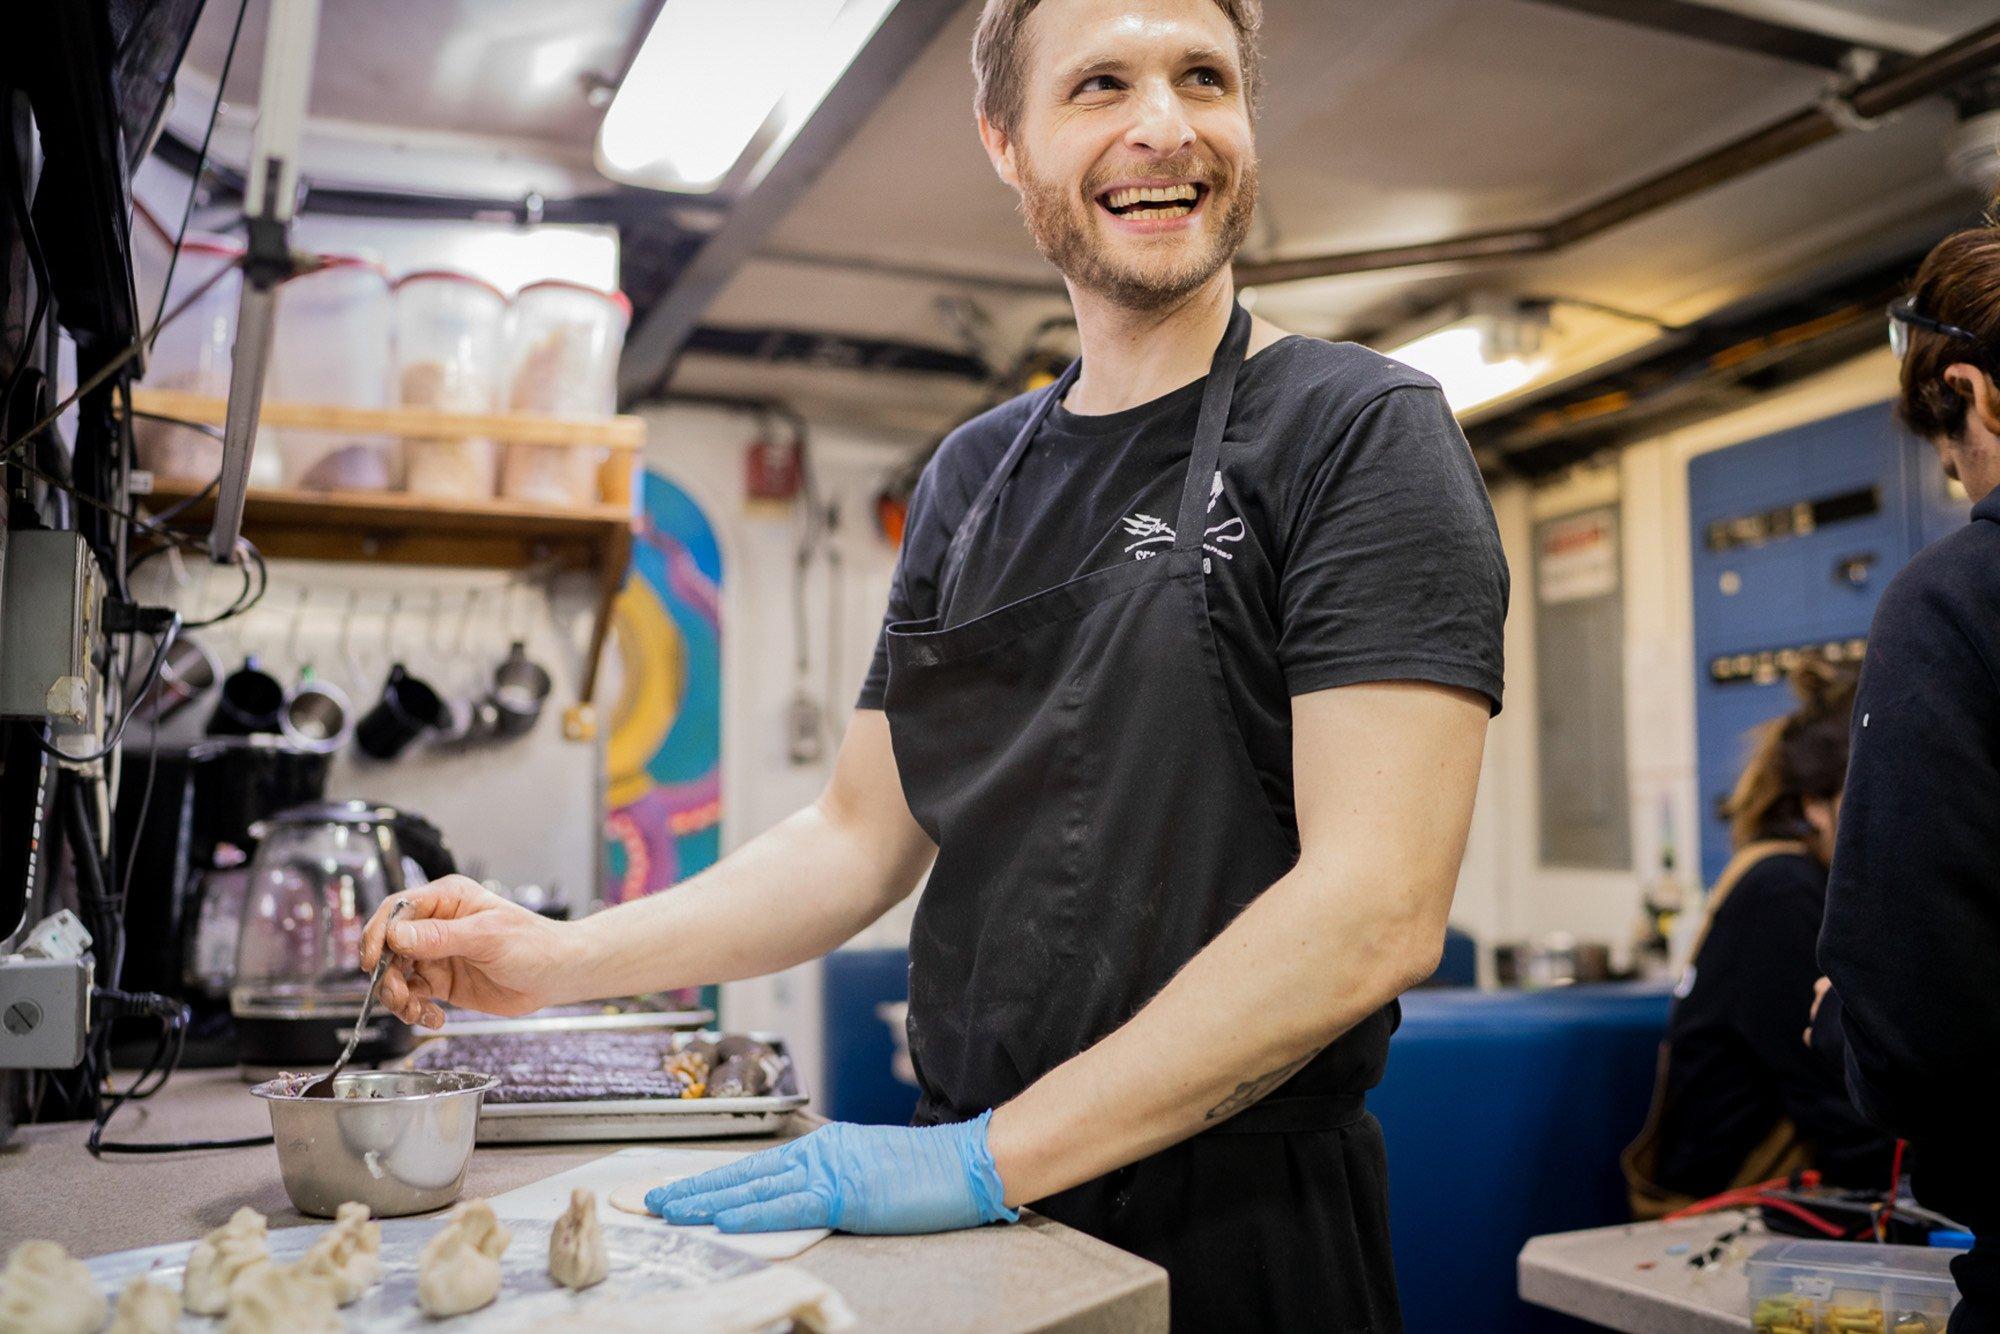 sea-shepherd-chef-vegan-dumplings SEA SHEPHERD